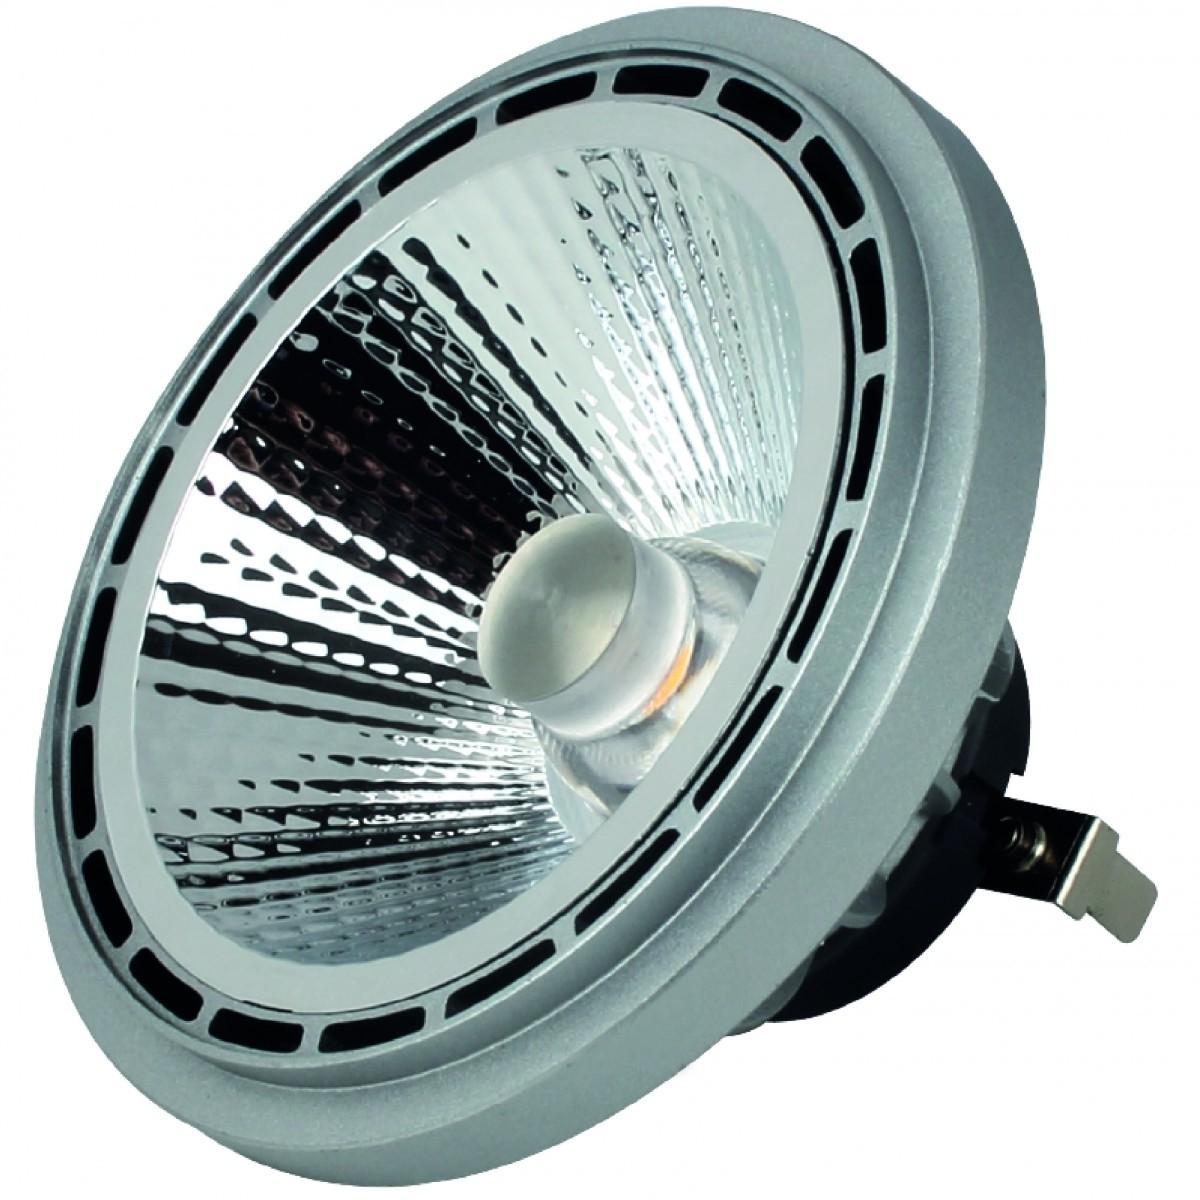 Civilight HALED DAR111 WC100P18-49166 G53 12 Volt AC/DC 18.0W 850lm 3000K warm weiß